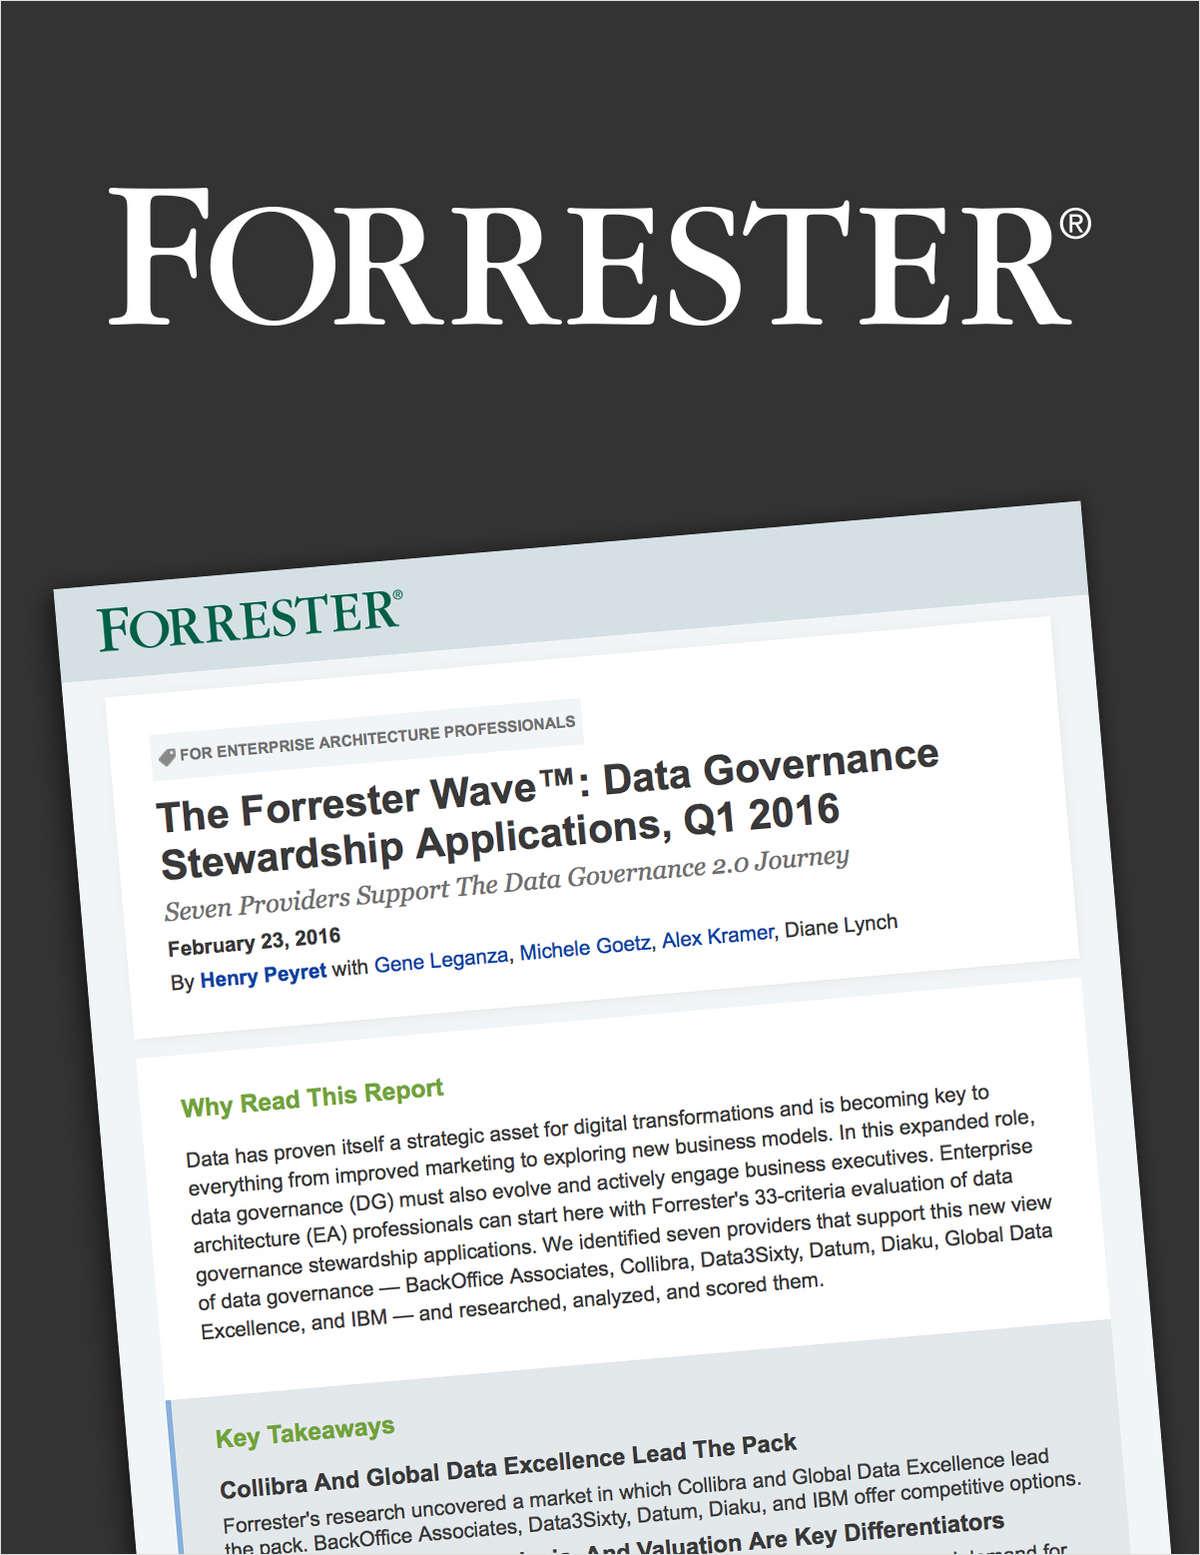 The Forrester Wave: Data Governance Stewardship Applications, Q1'16